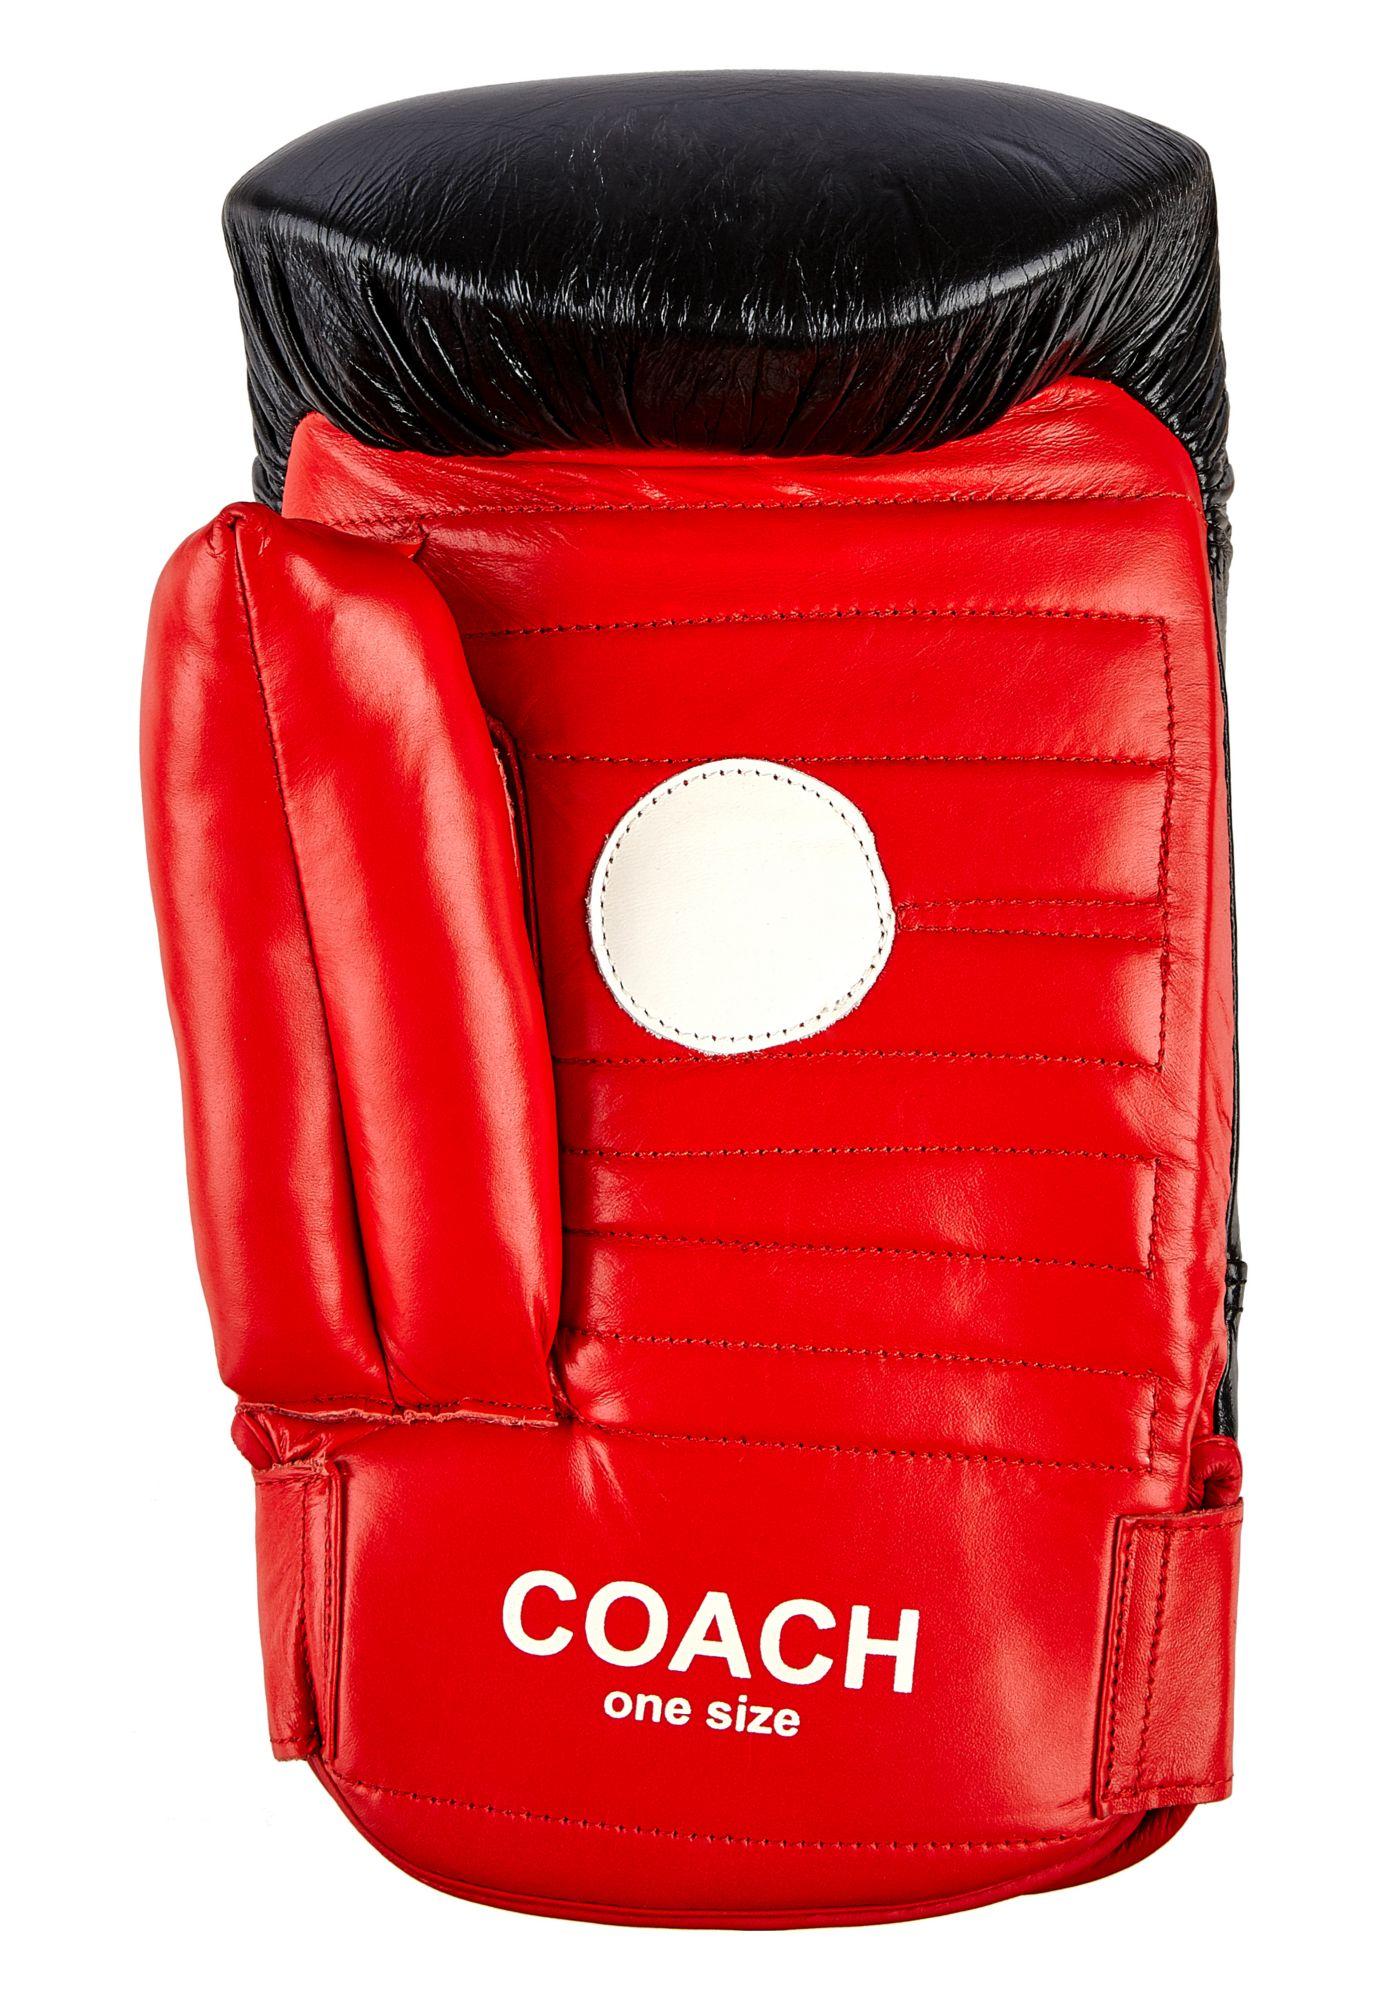 BENLEE ROCKY MARCIANO Benlee Rocky Marciano Boxhandschuhe »COACH«